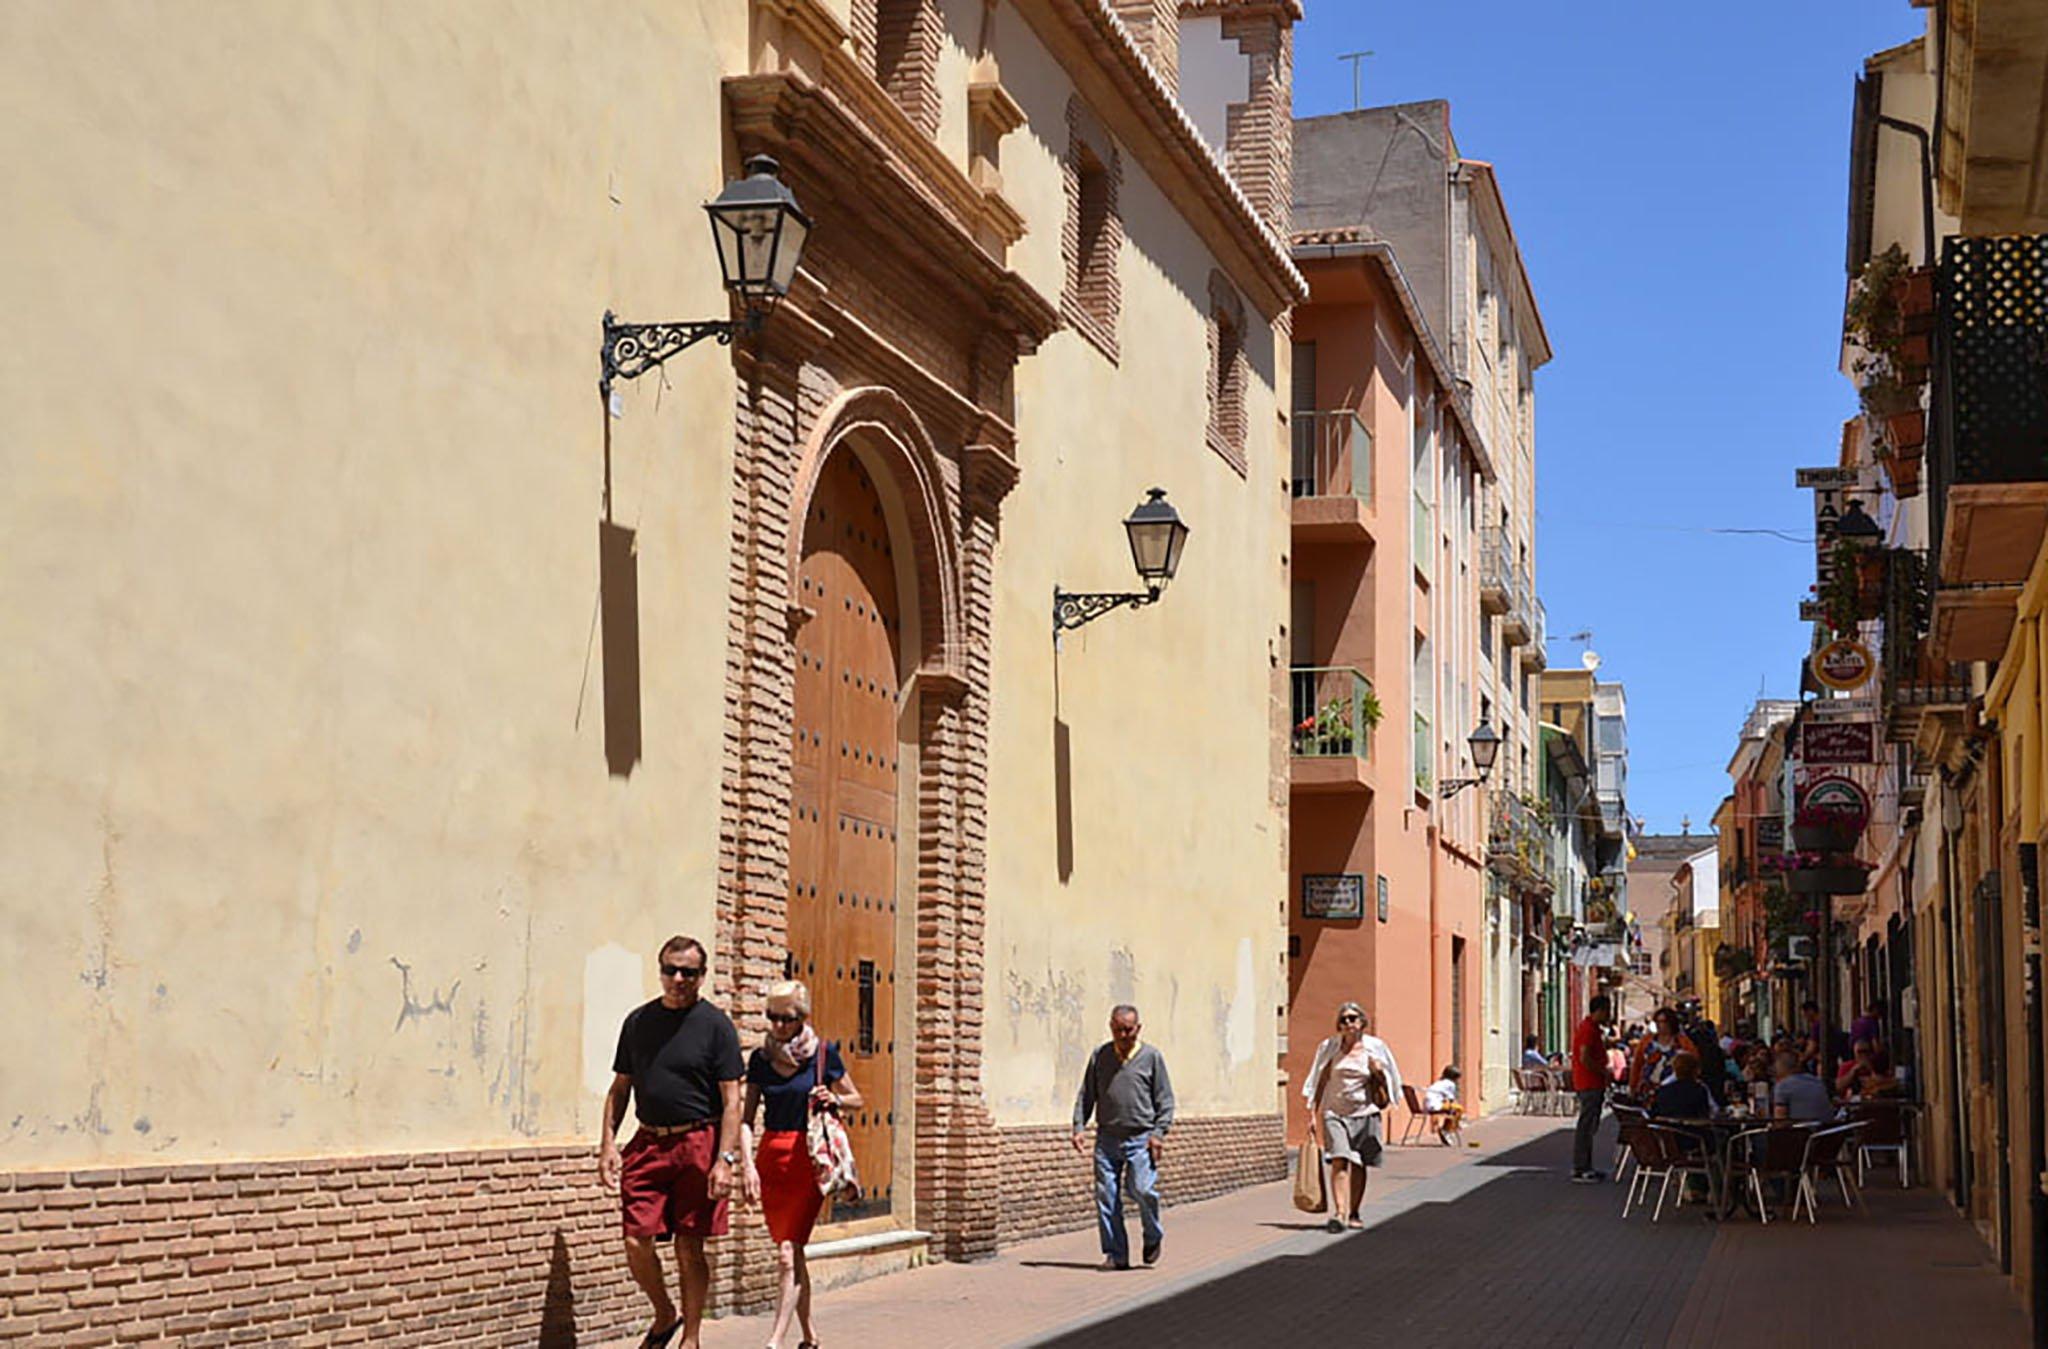 Altar of the Church of Loreto